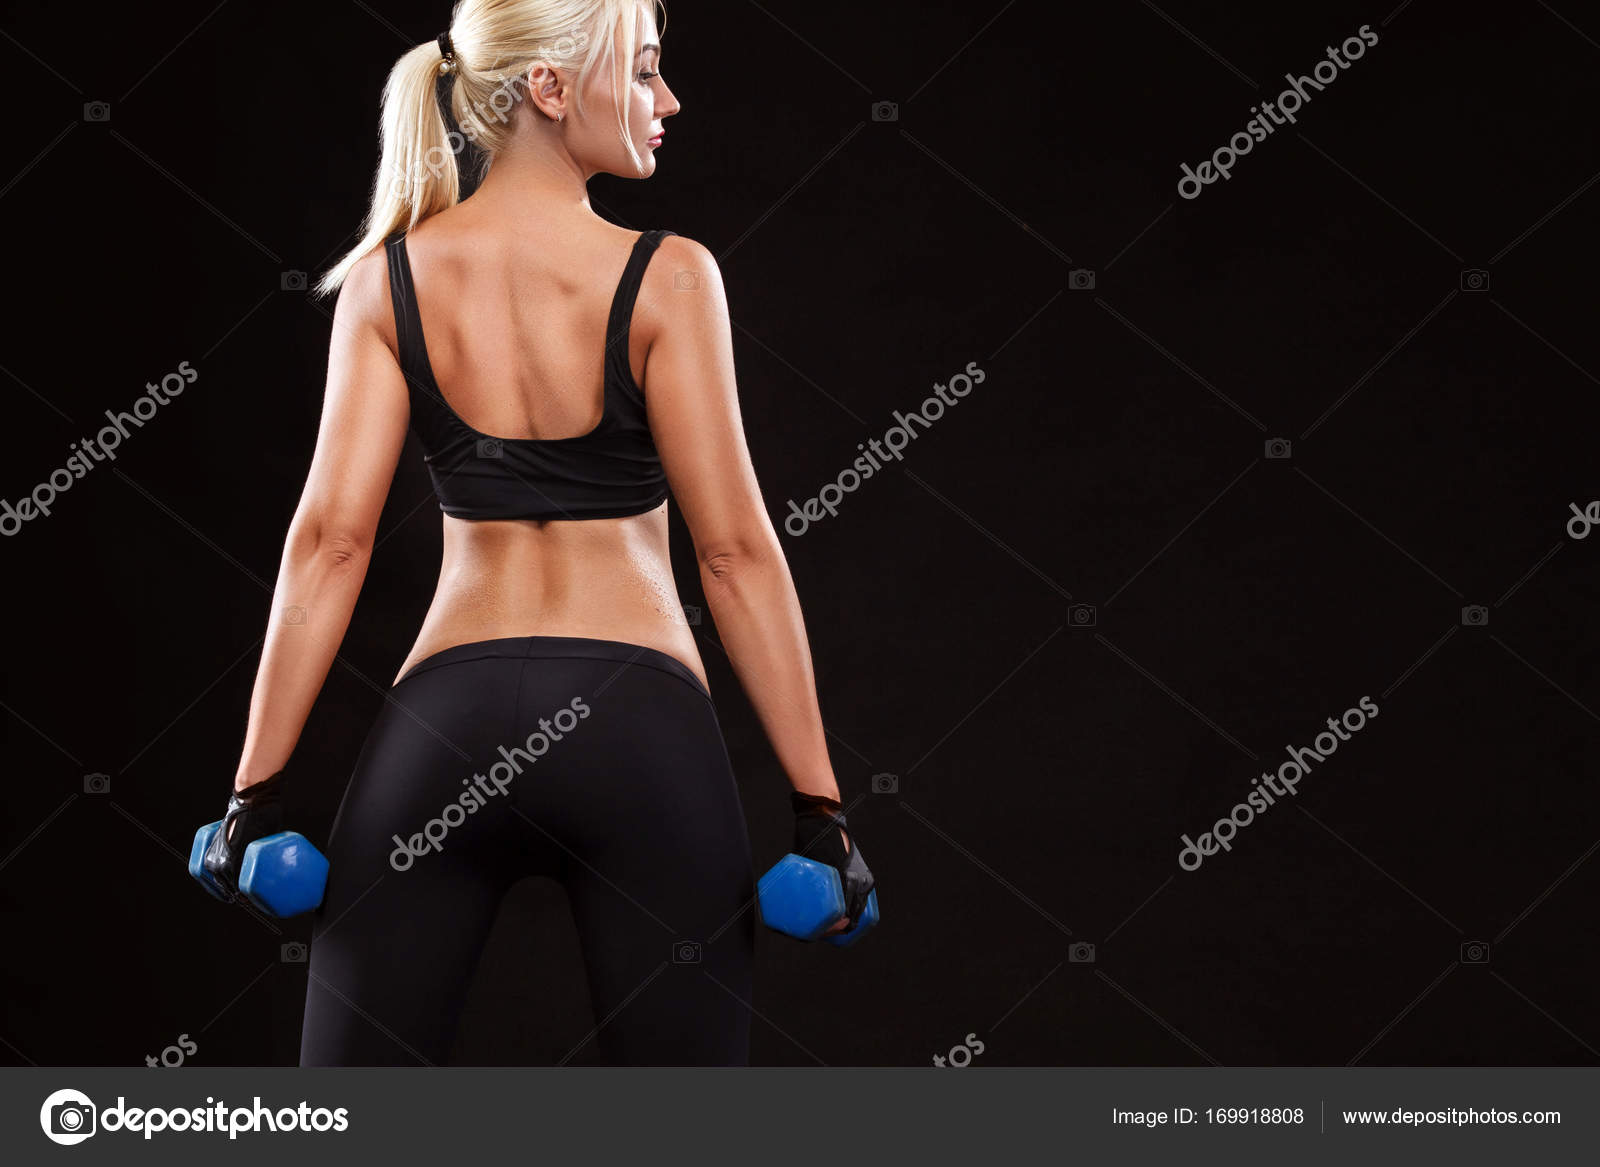 Imágenes Motivacion Gym Para Mujeres Deportiva Mujer